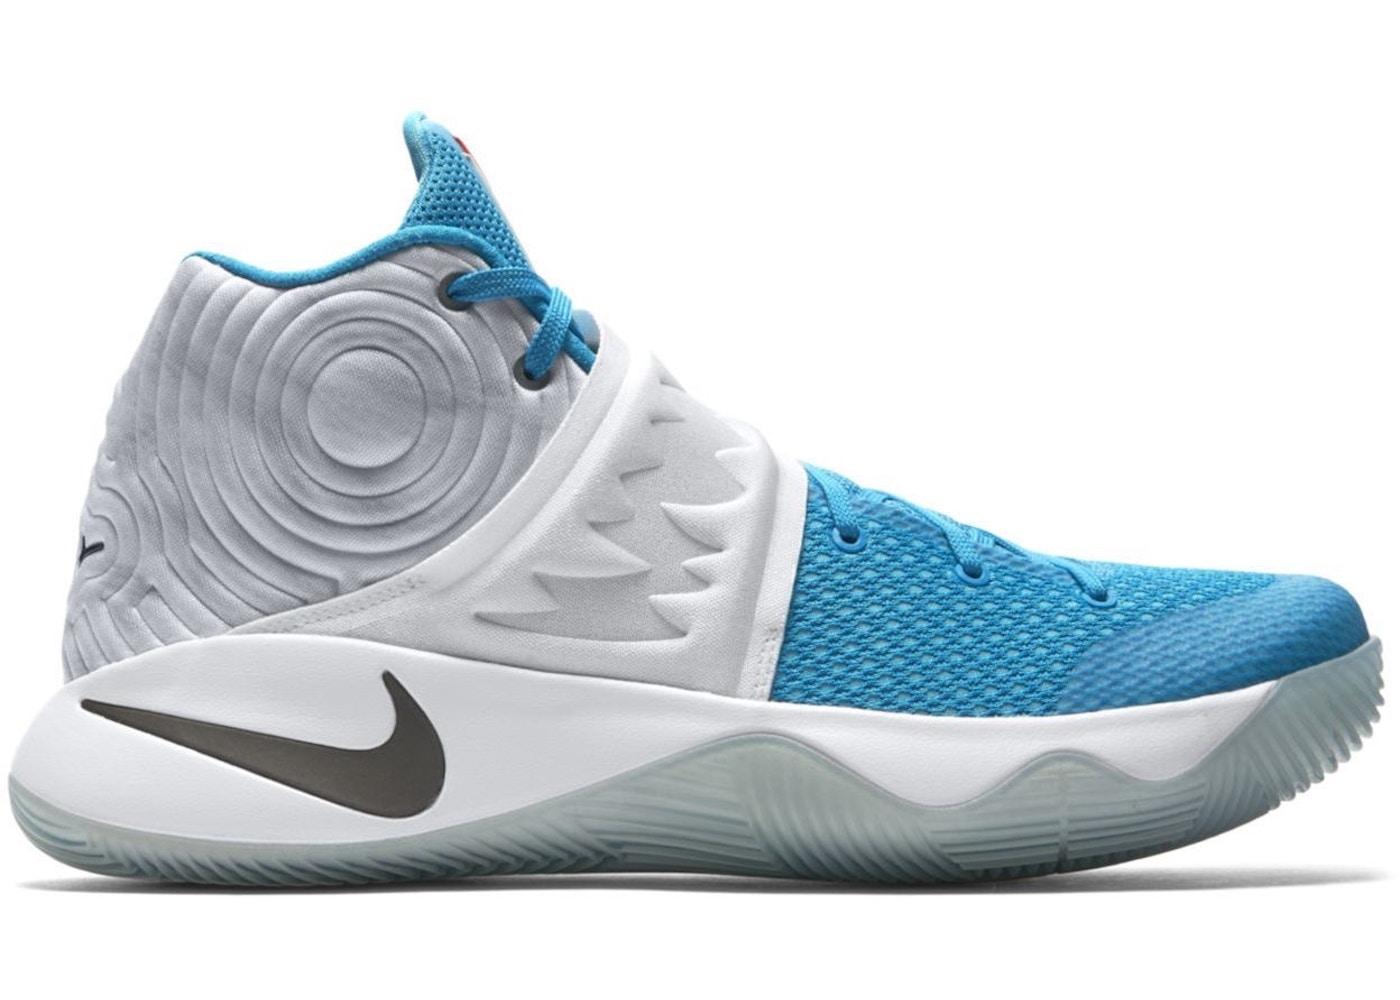 491f8bbfbf8 Nike Basketball Kyrie Shoes - Volatility